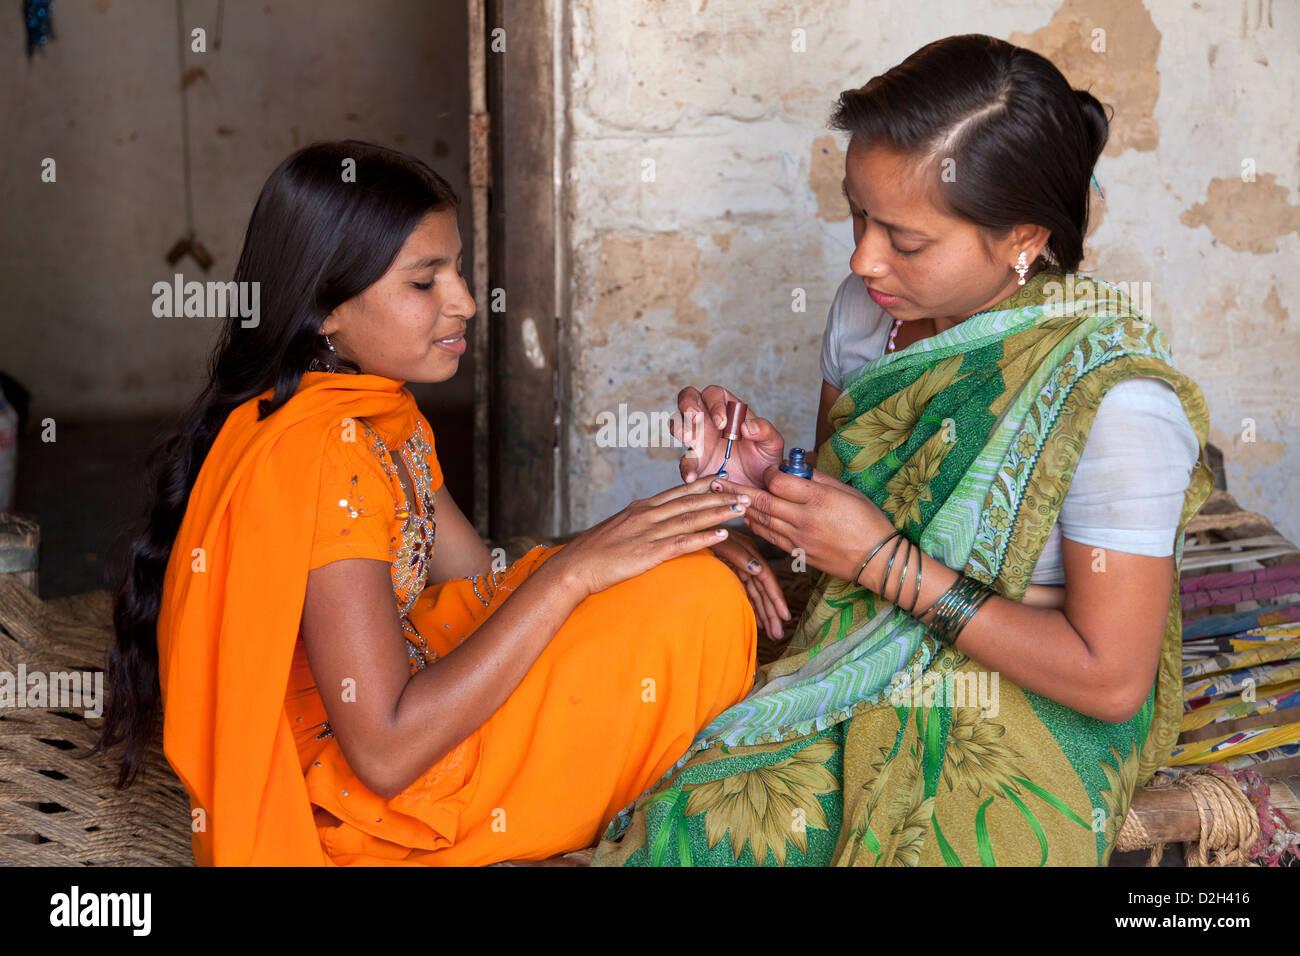 India, uttar Pradesh, Agra Older adult sister painting nails of younger teenage sister - Stock Image